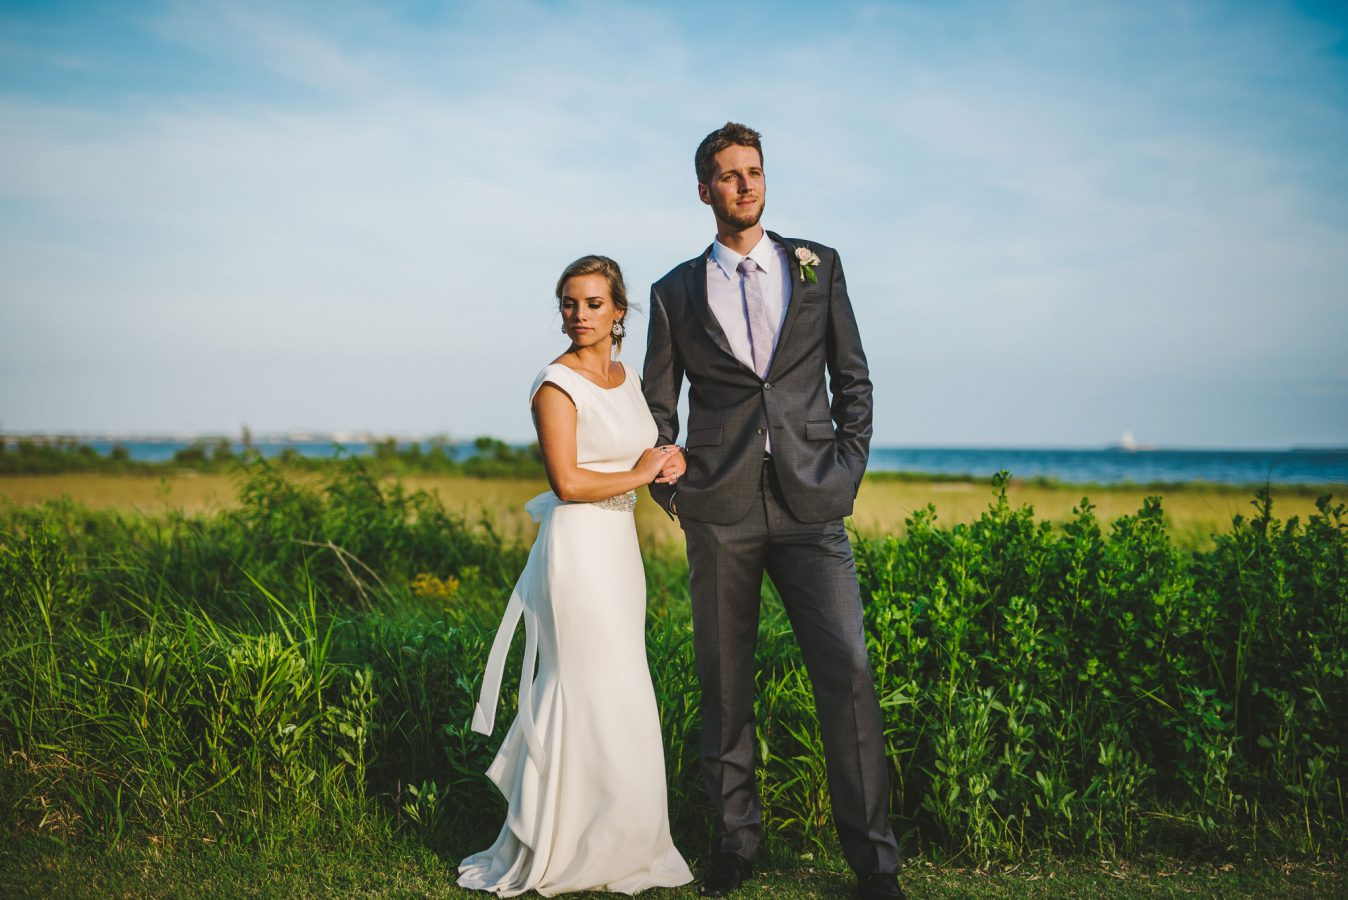 fete-photography-weddings-2017-003